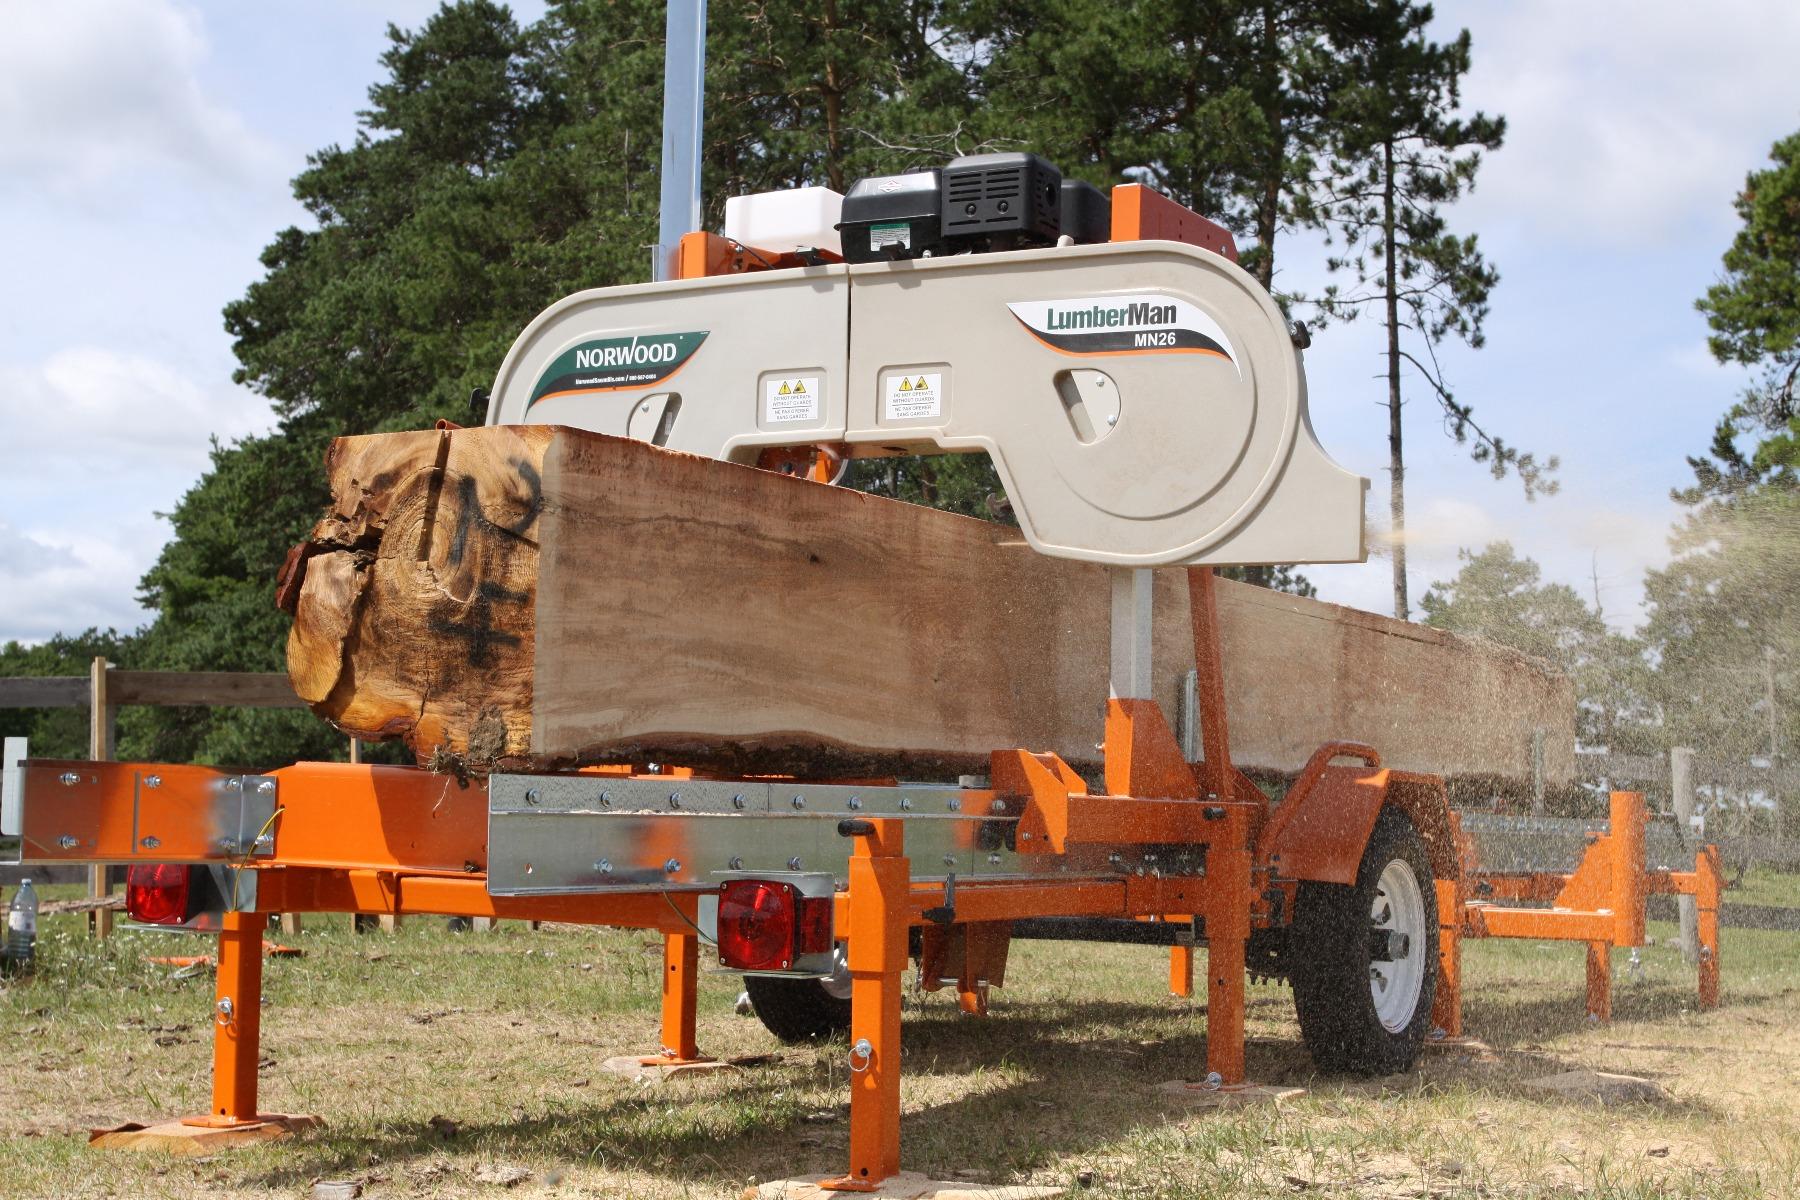 Norwood LumberMan MN26 SAWMILL